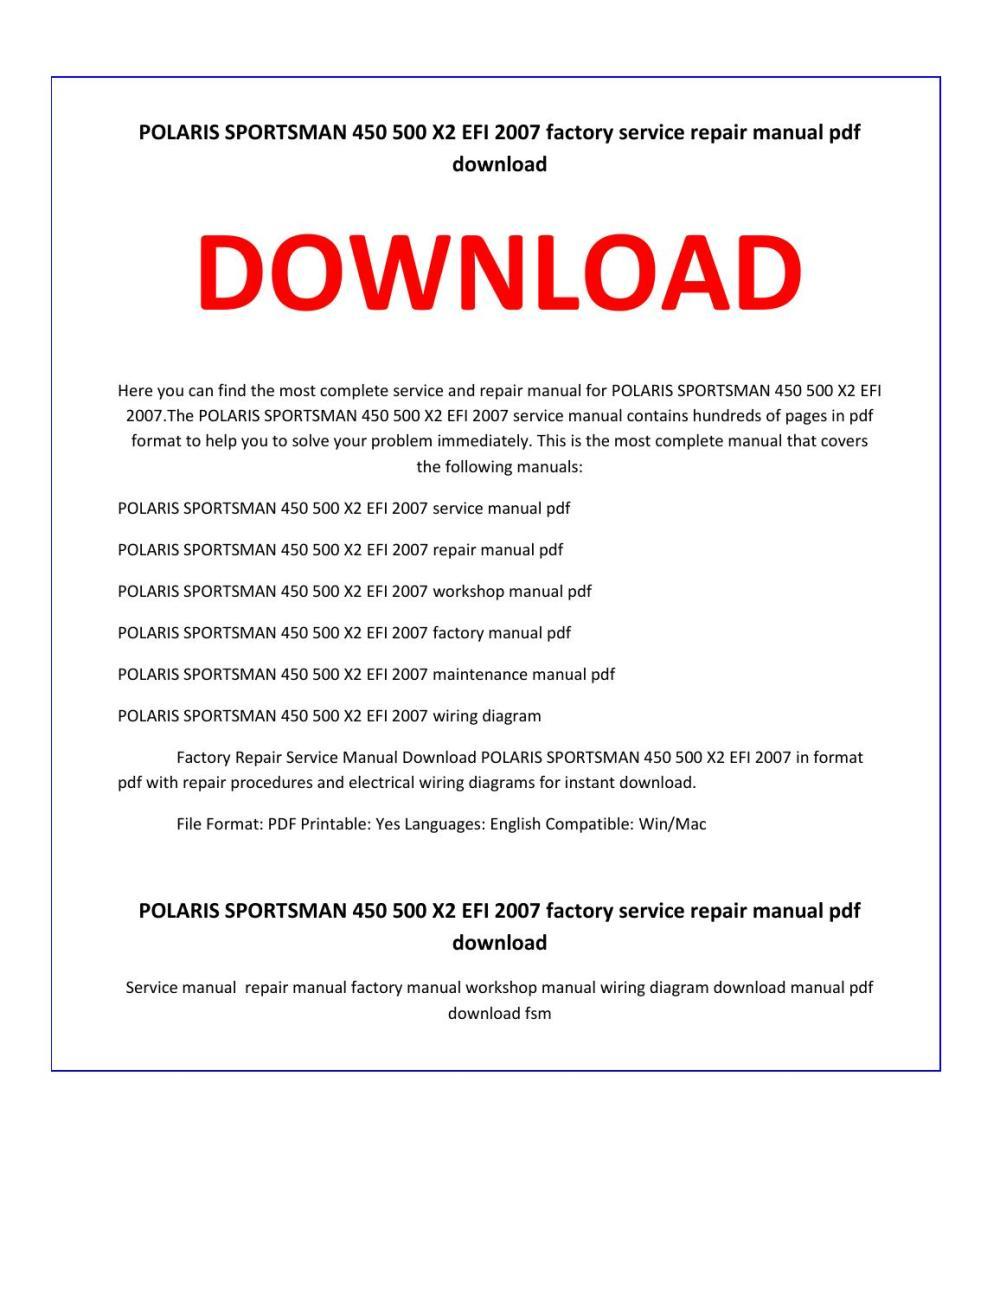 medium resolution of polaris sportsman 450 500 x2 efi 2007 service repair manual